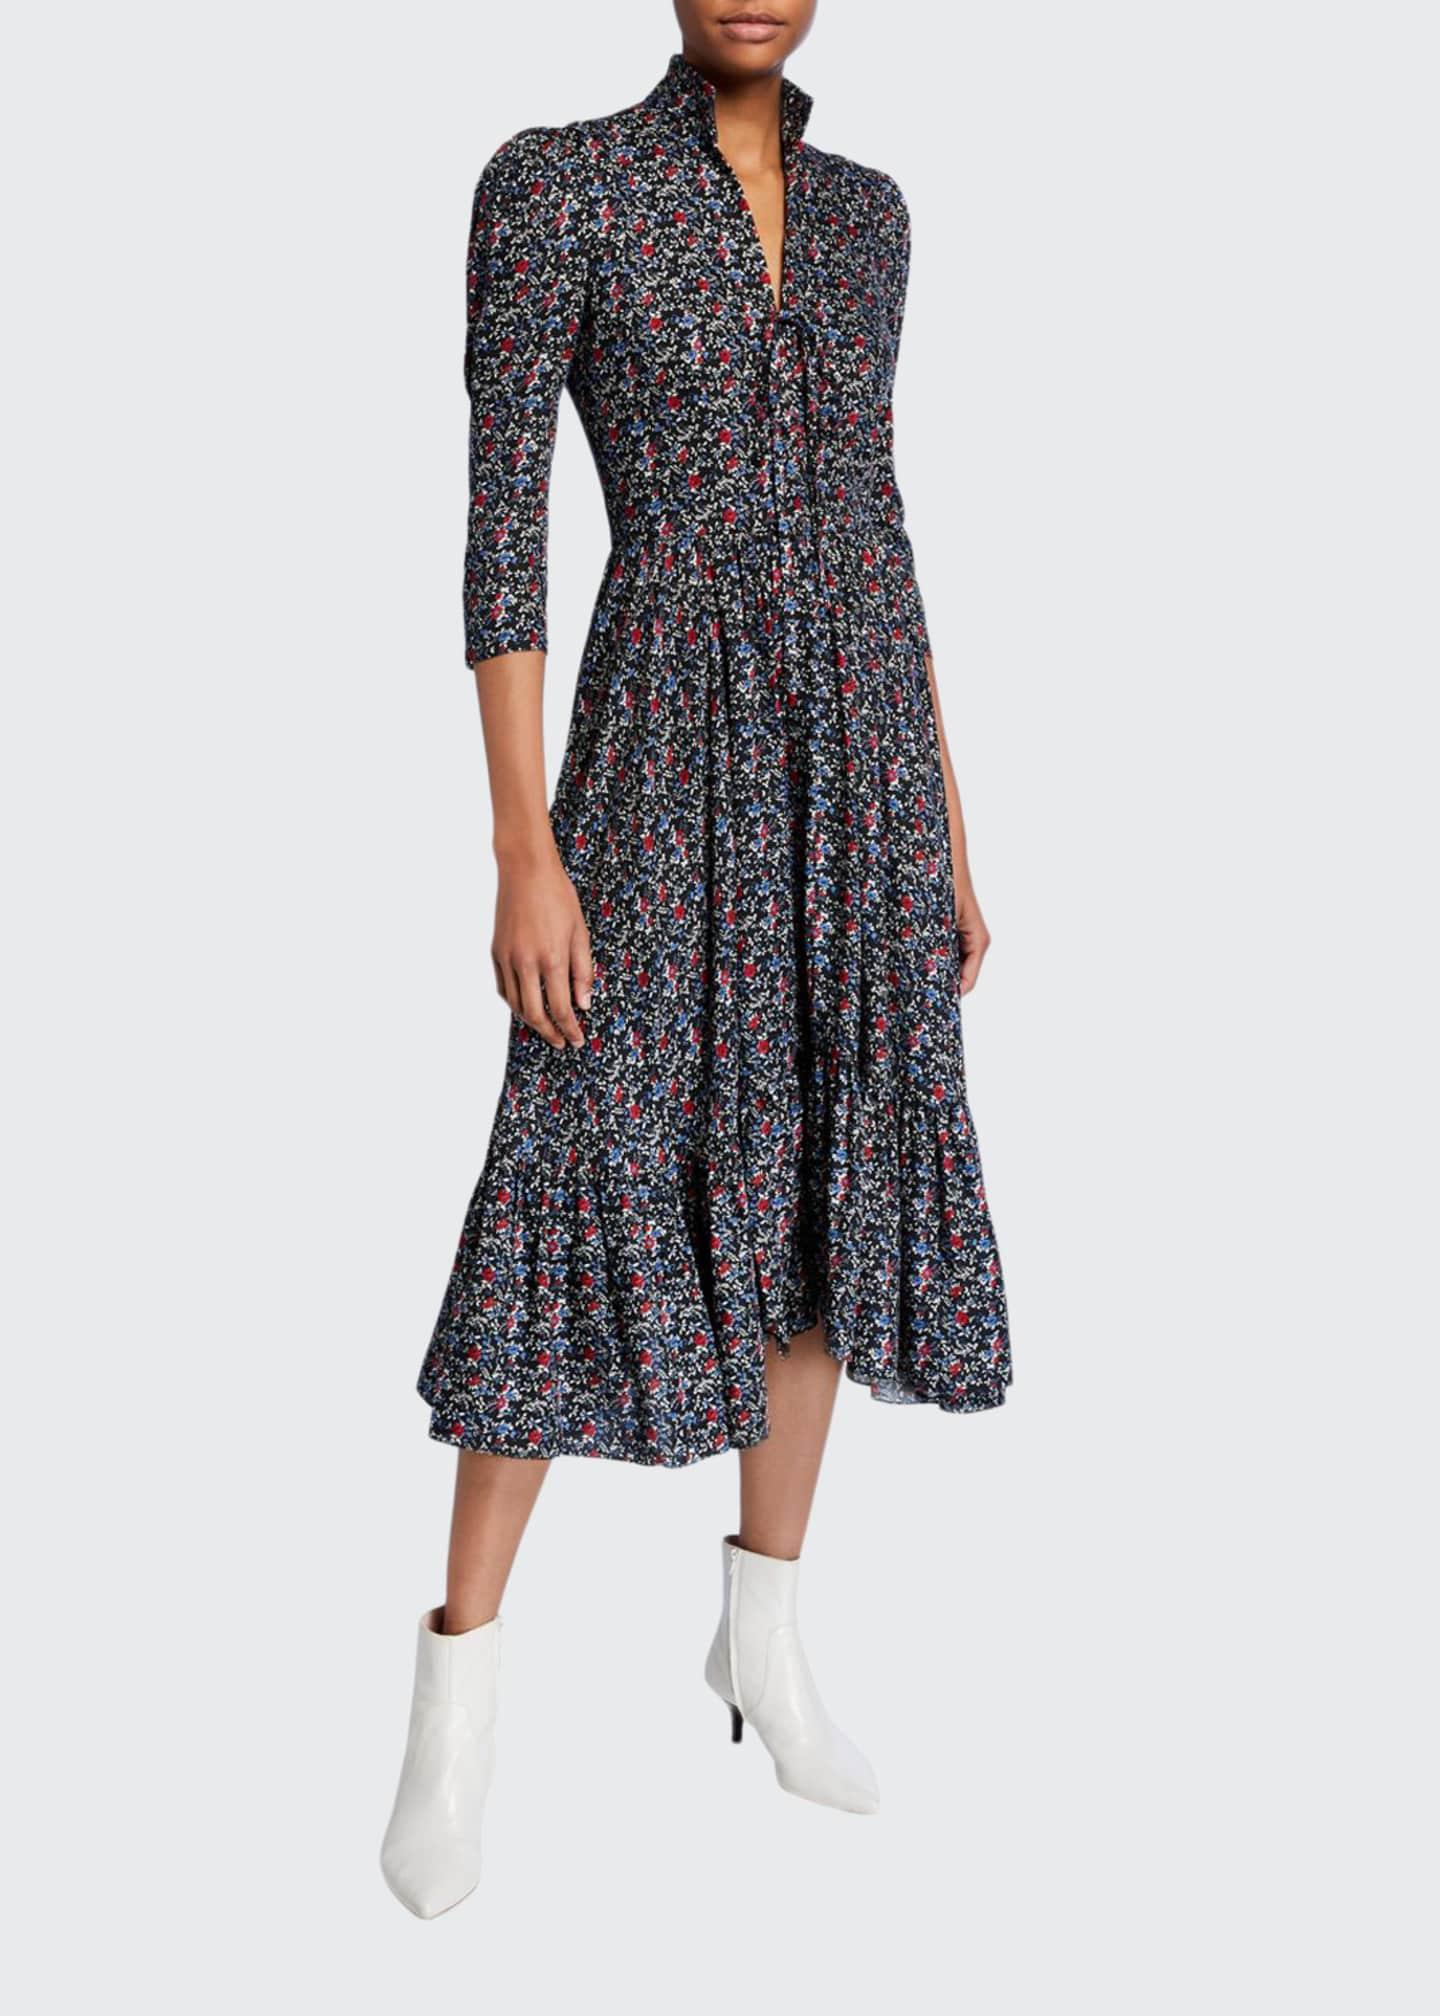 Petersyn Lorna Printed 3/4-Sleeve Midi Dress